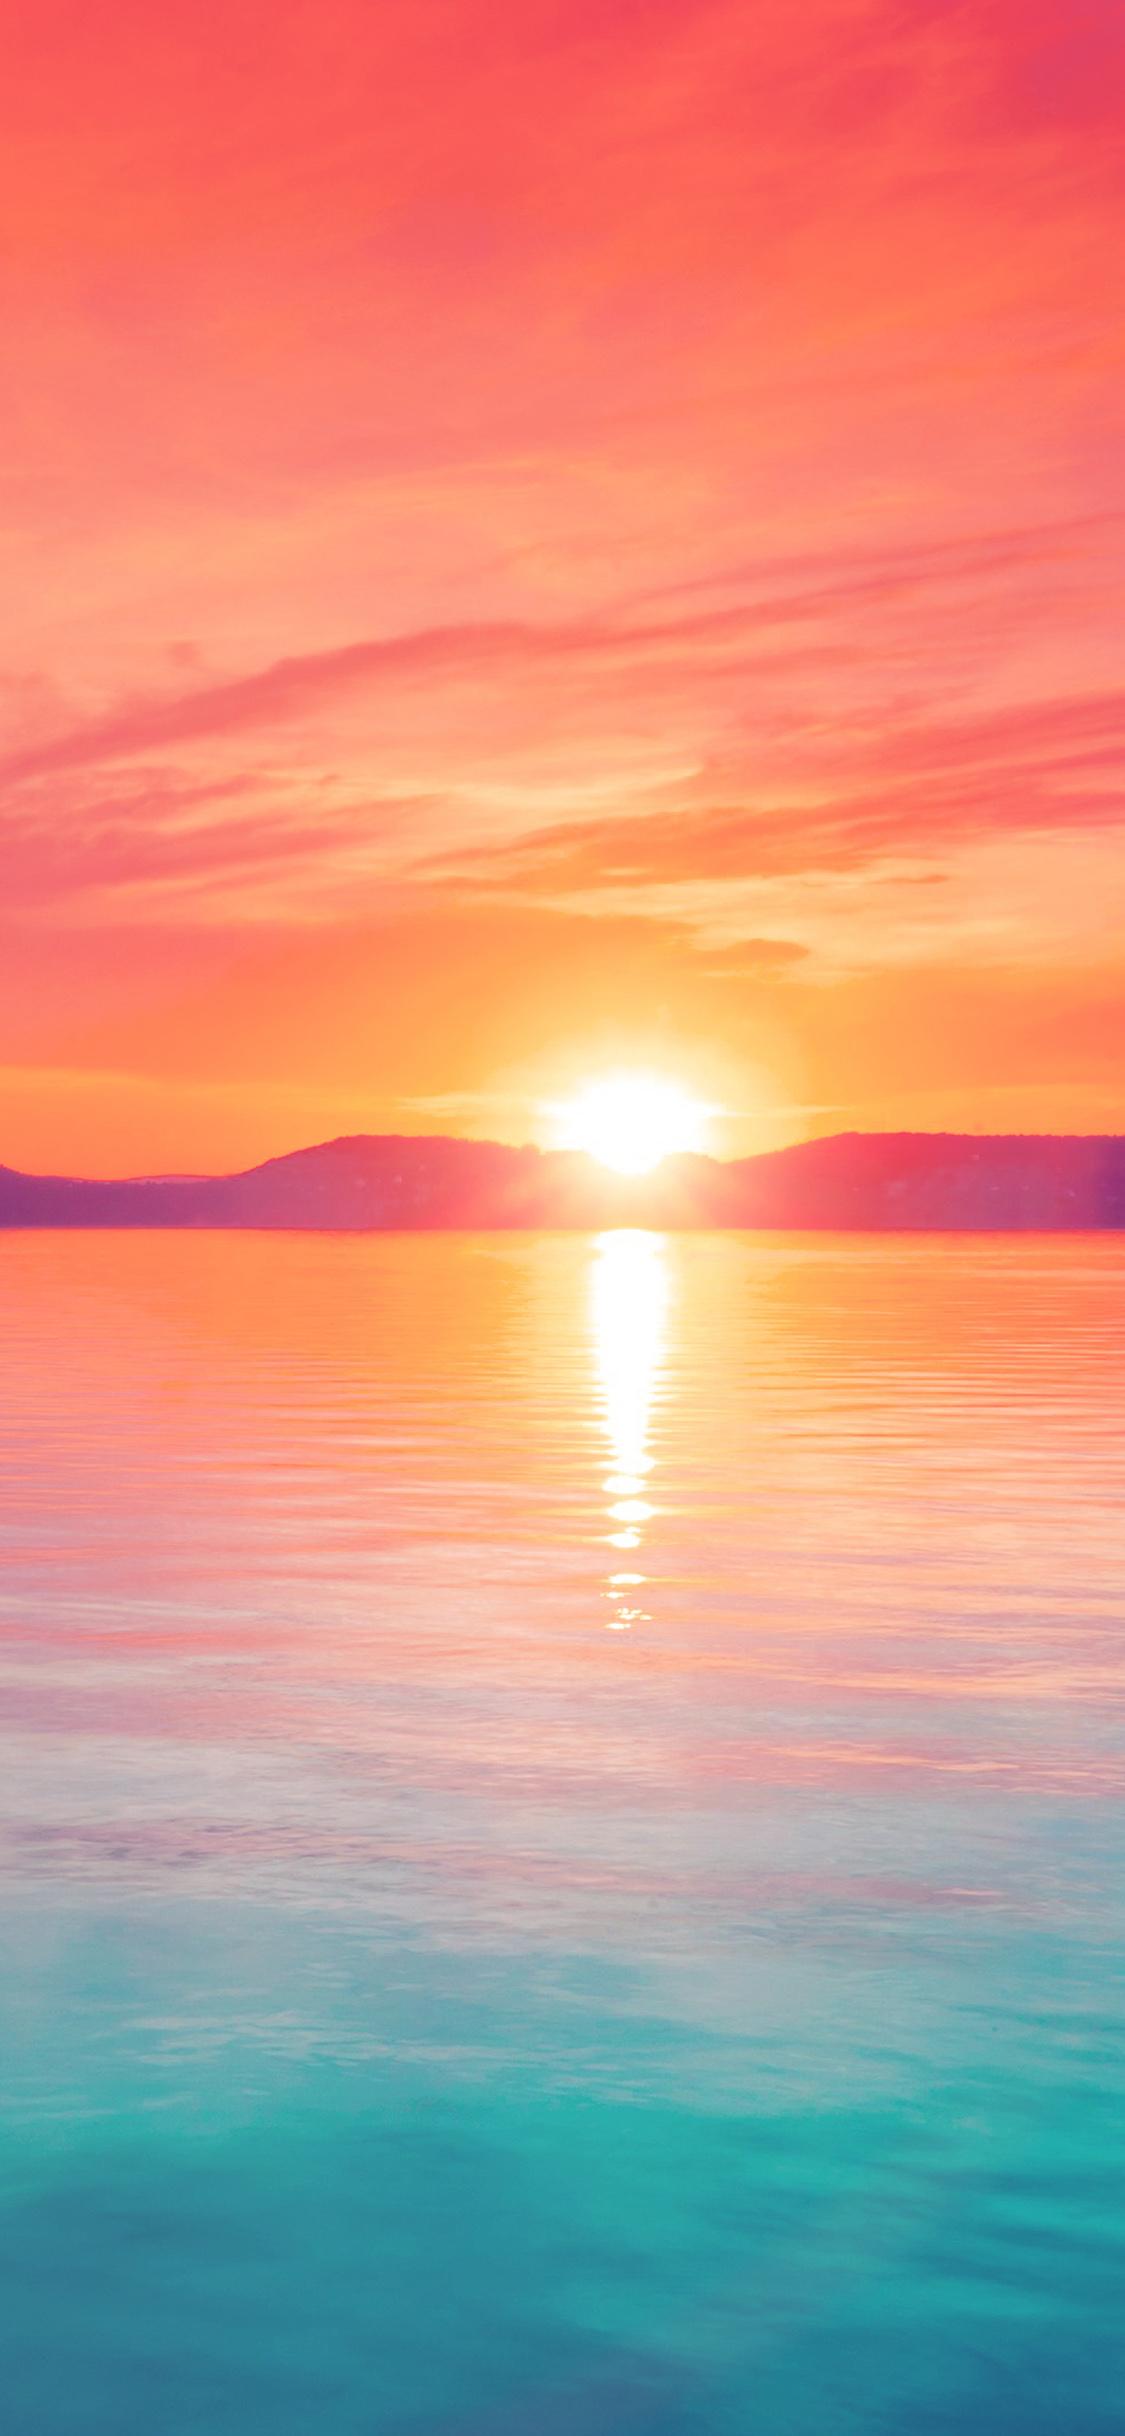 Iphone X - Sunset Wallpaper Iphone X , HD Wallpaper & Backgrounds